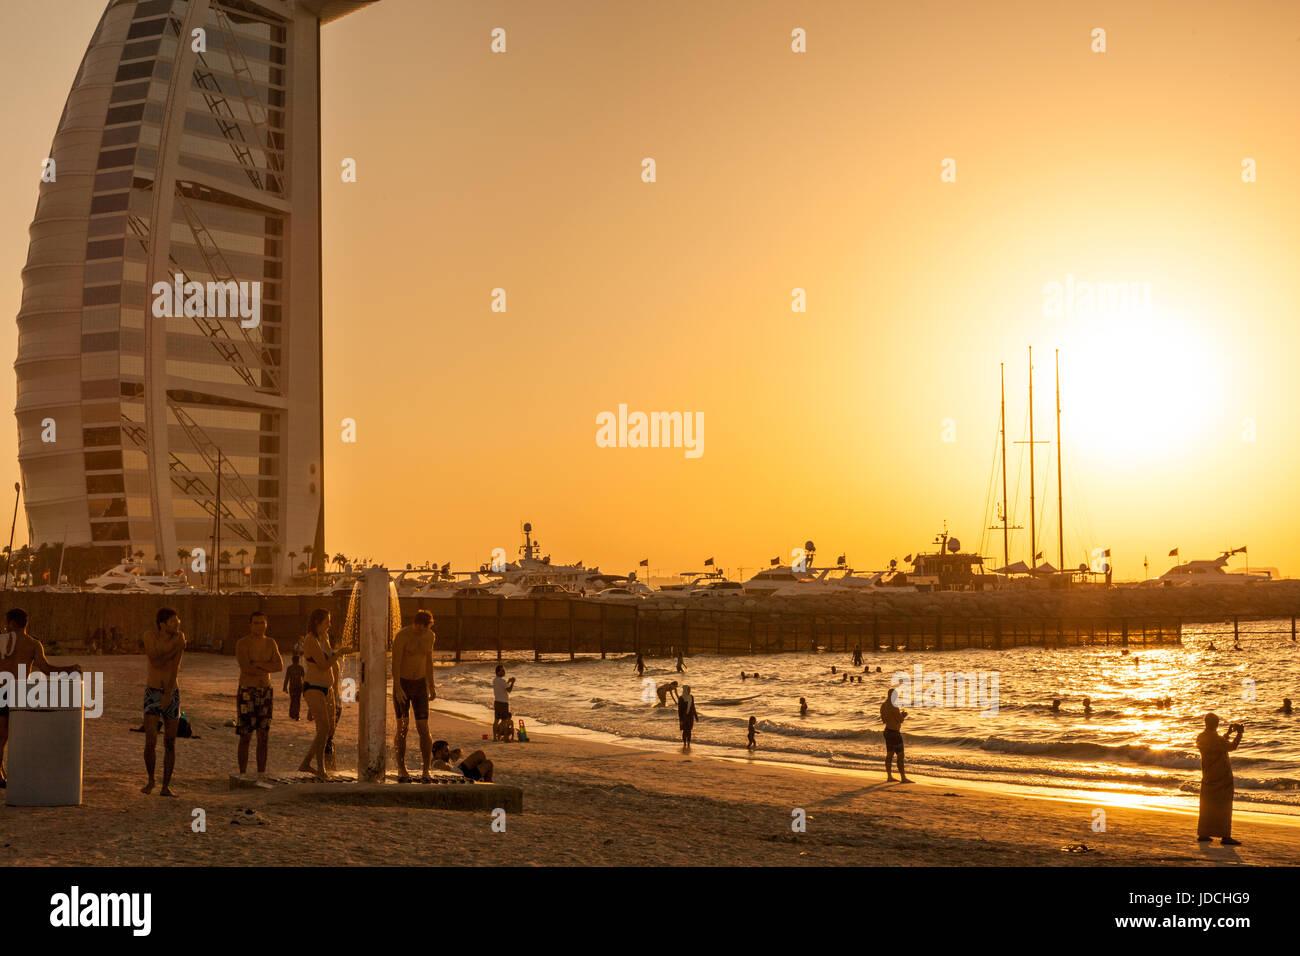 VAE/DUBAI - 26 SEP 2012 - Sonnenuntergang im berühmten Burj Al Arab Hotel, Sonnenuntergang im berühmten Stockbild